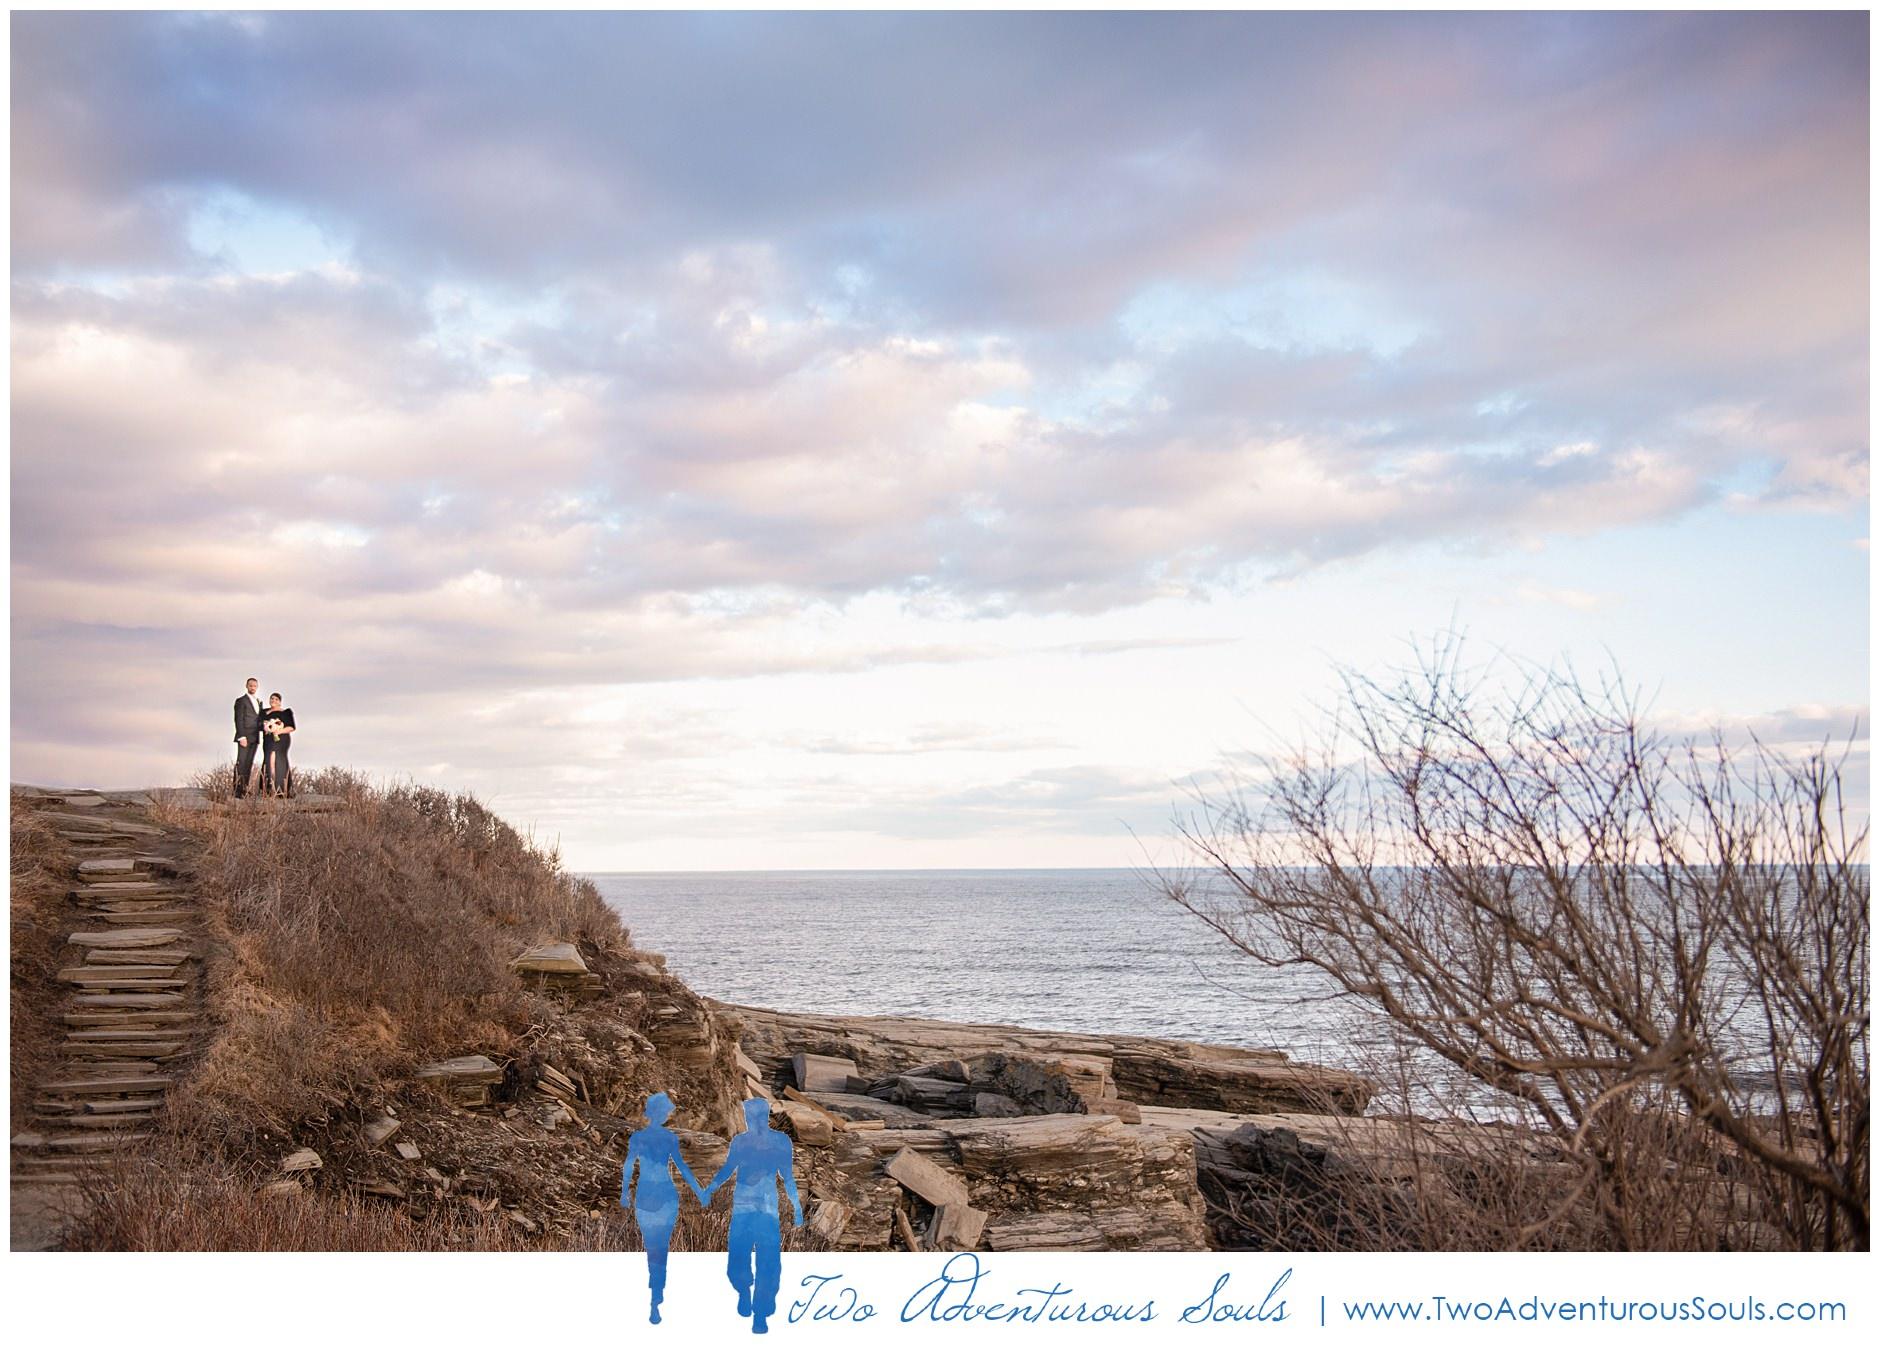 Inn by The Sea Elopement, Maine Elopement Photographer, Maine Wedding Photographers, Two Adventurous Souls_040619_0022.jpg